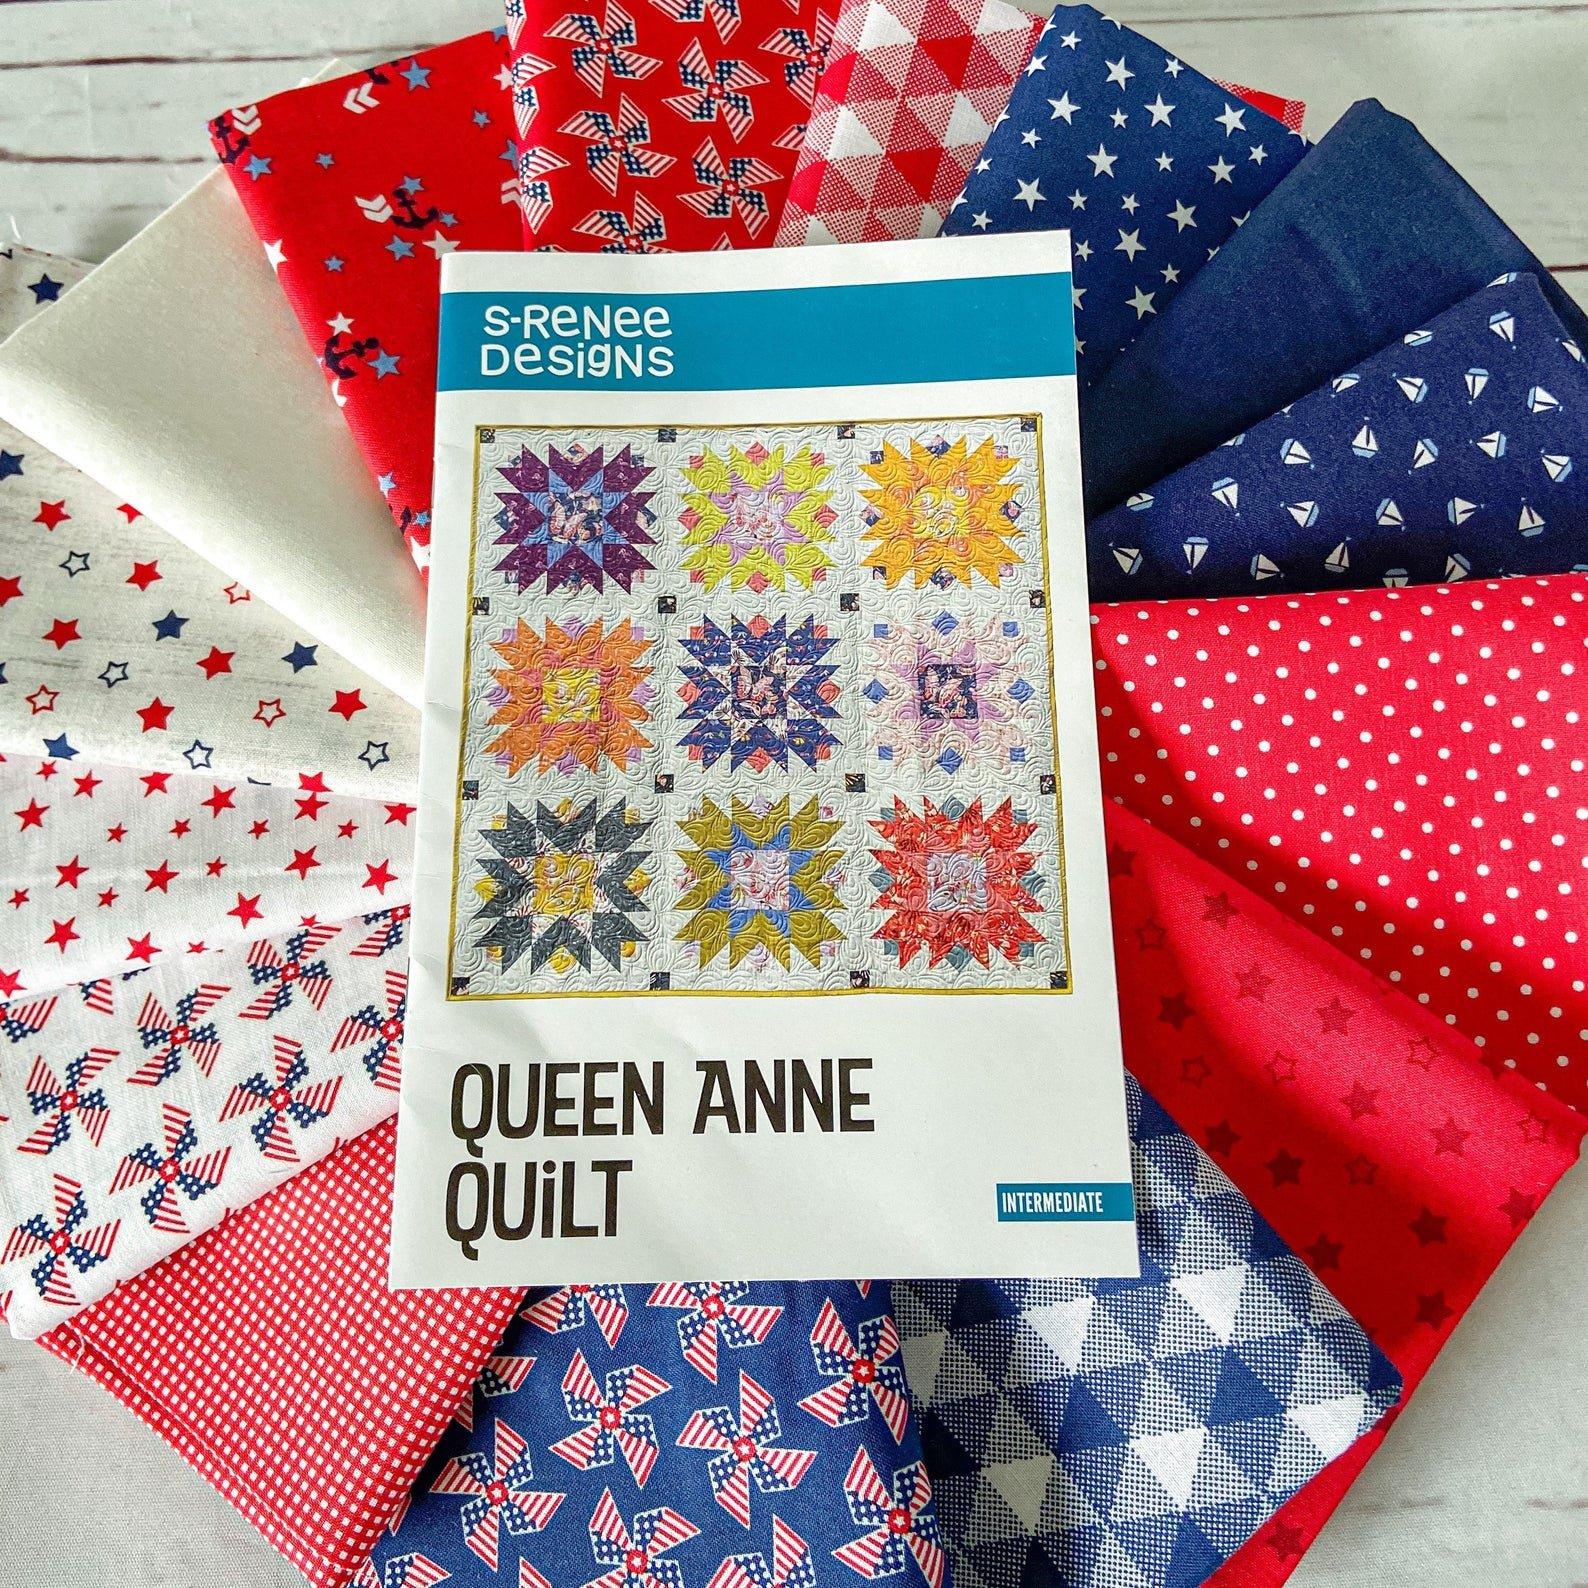 Queen Anne Americana Quilt Kit